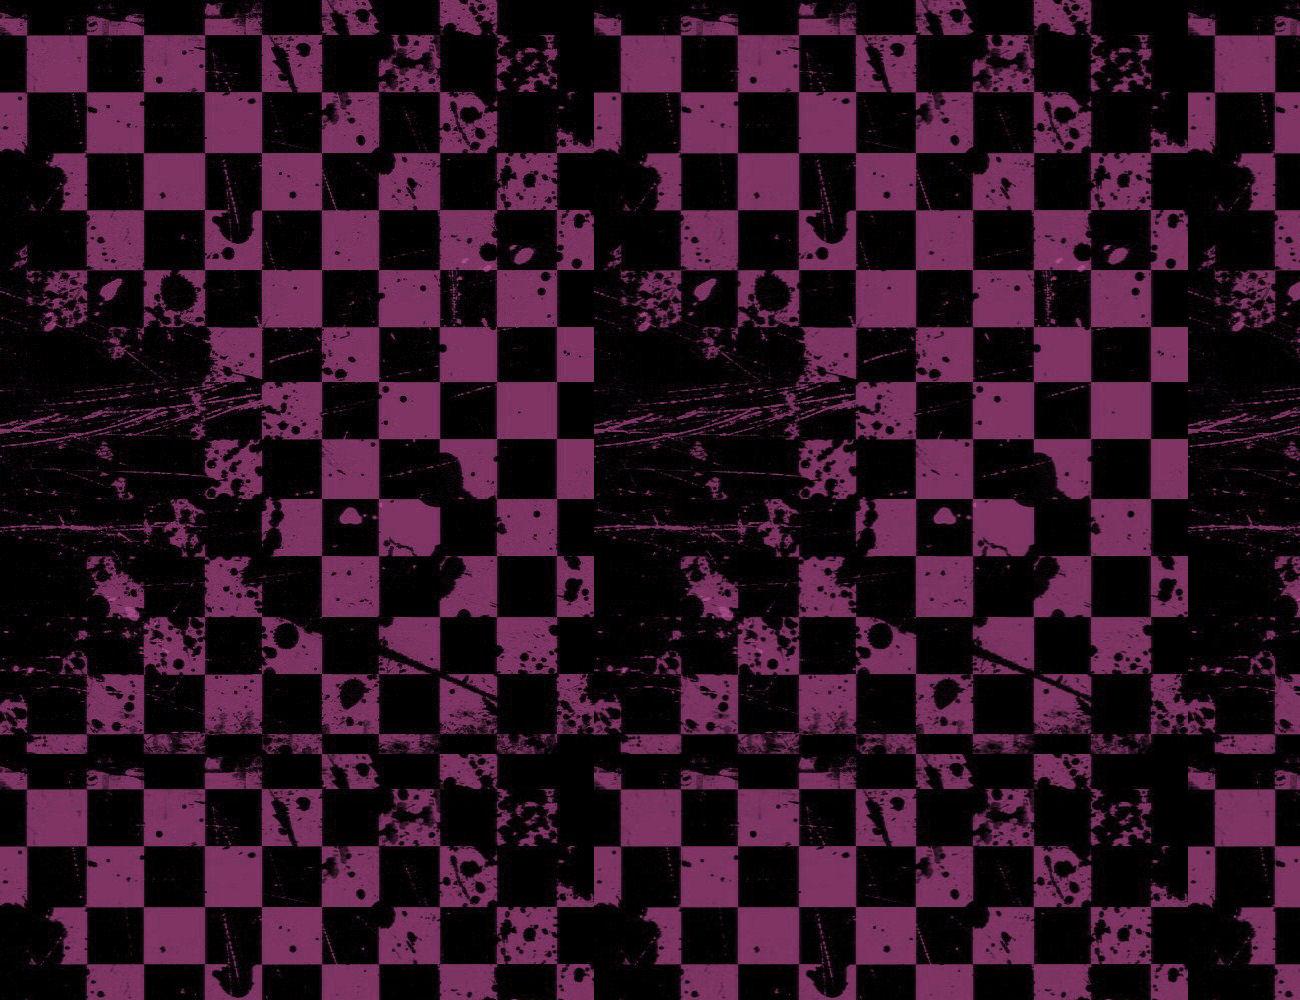 PurpleBlack Checker Twitter Backgrounds PurpleBlack Checker Twitter 1300x1000